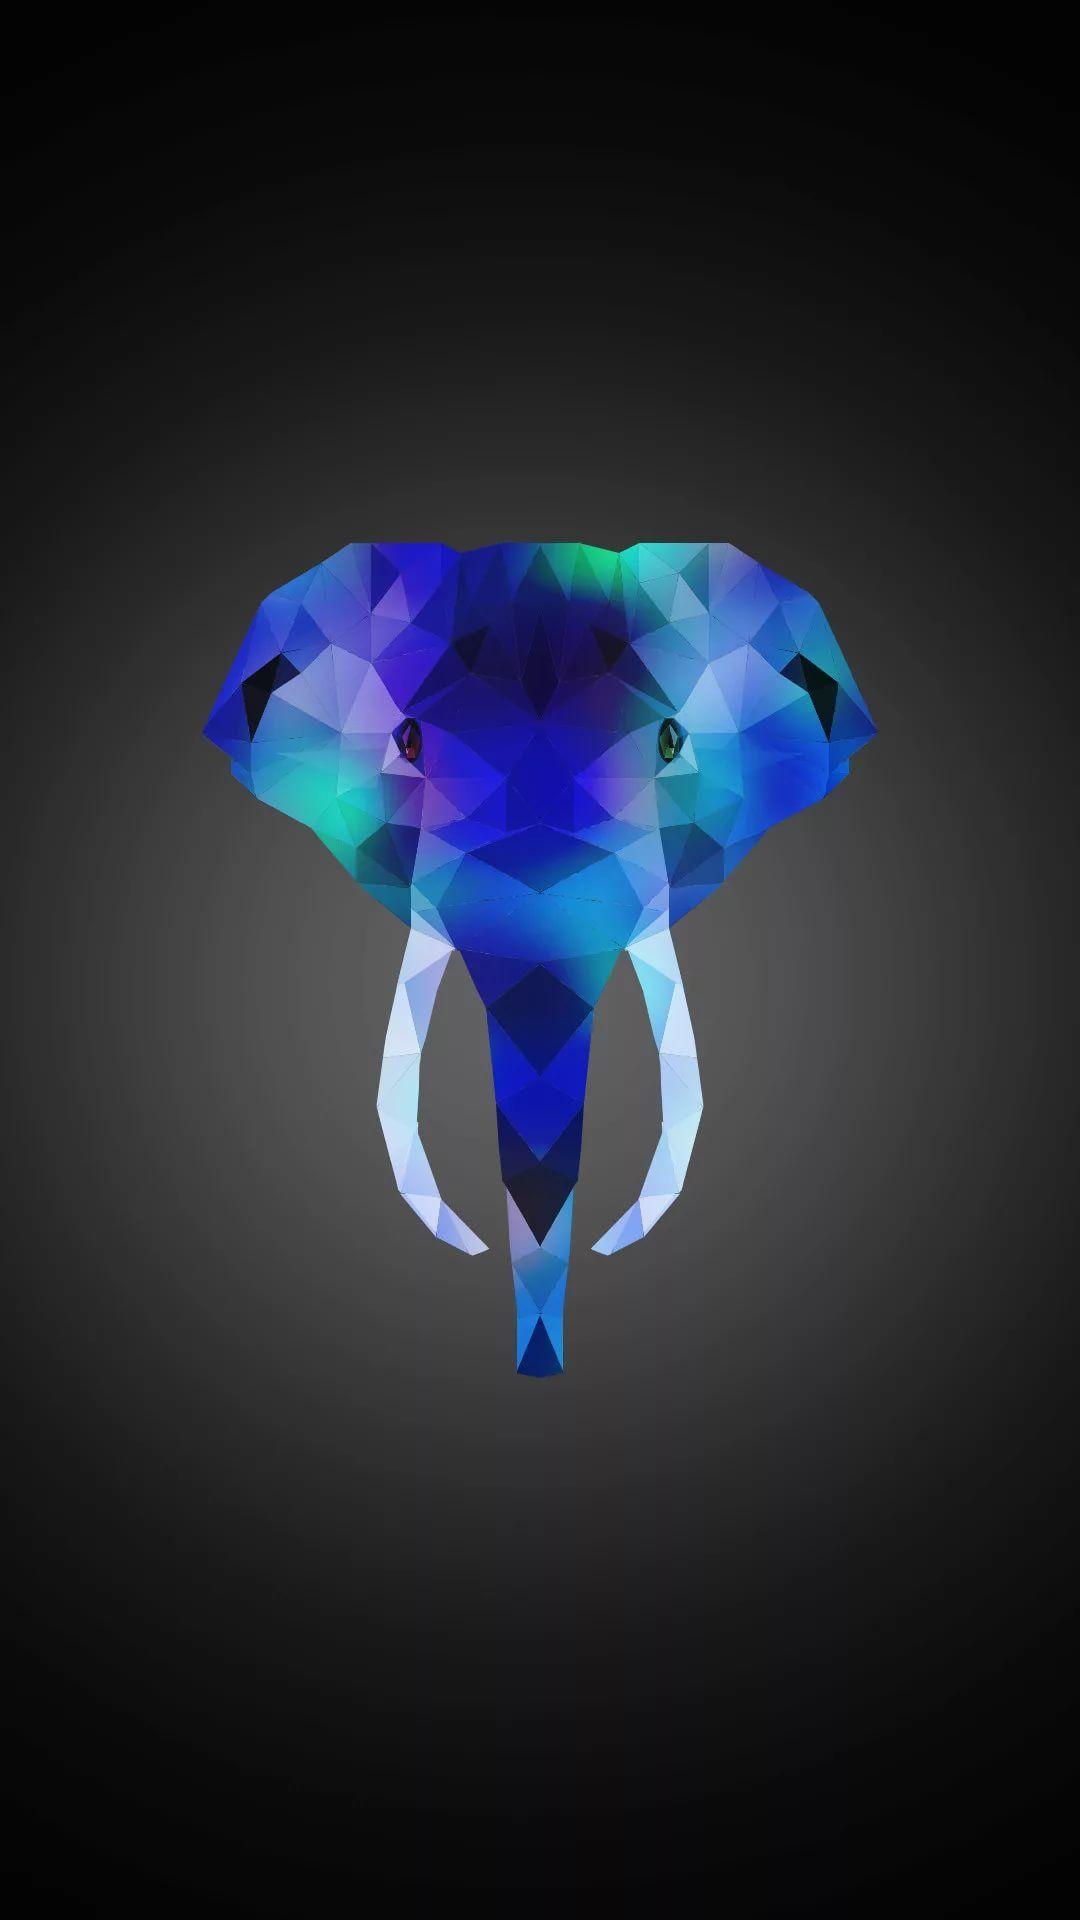 Elephant Tumblr iPhone 6 wallpaper